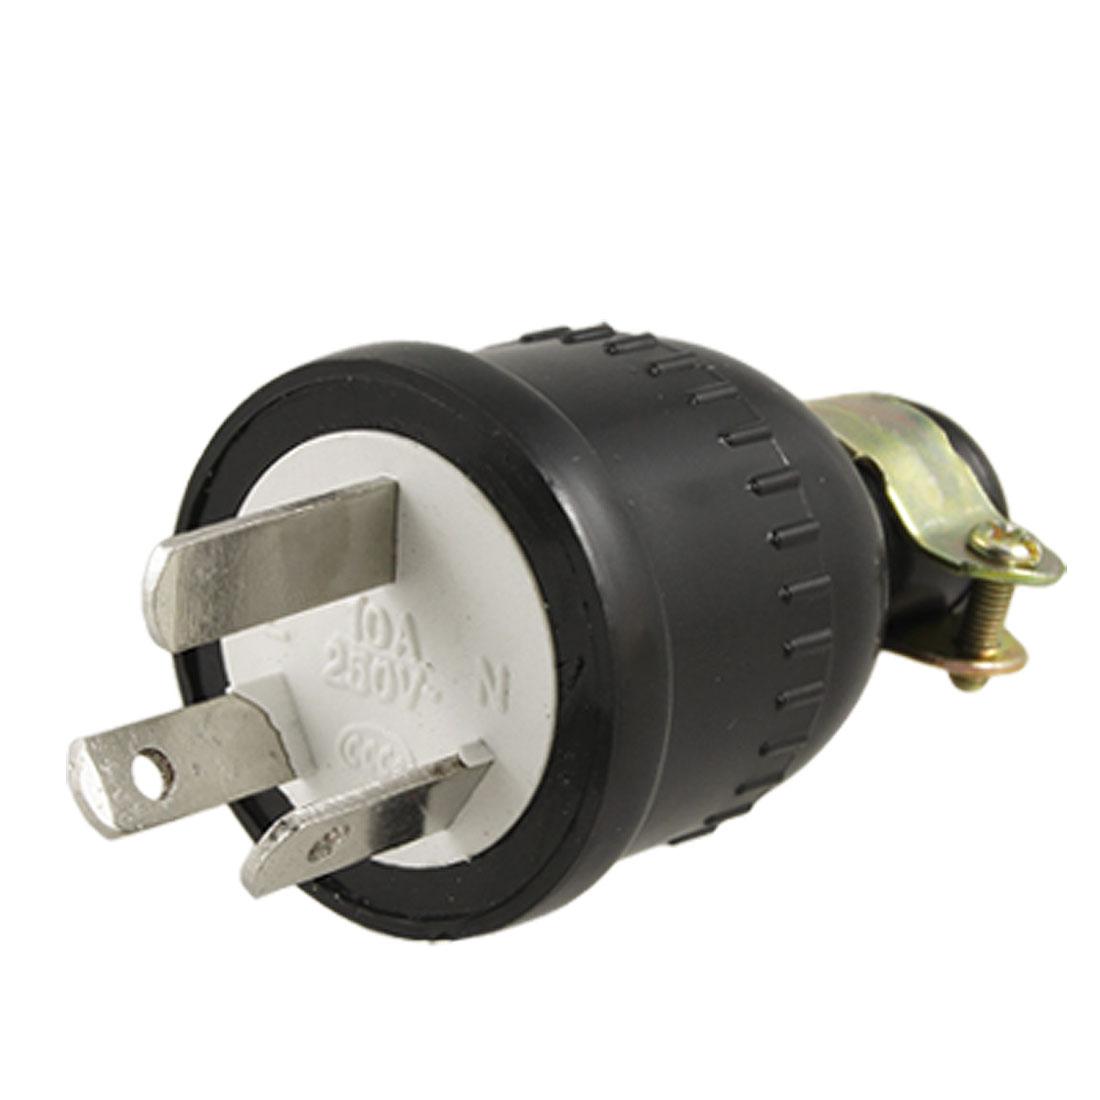 Black Plastic Shell Power Cord Plug Connector Head AC 250V 10A AU Plug